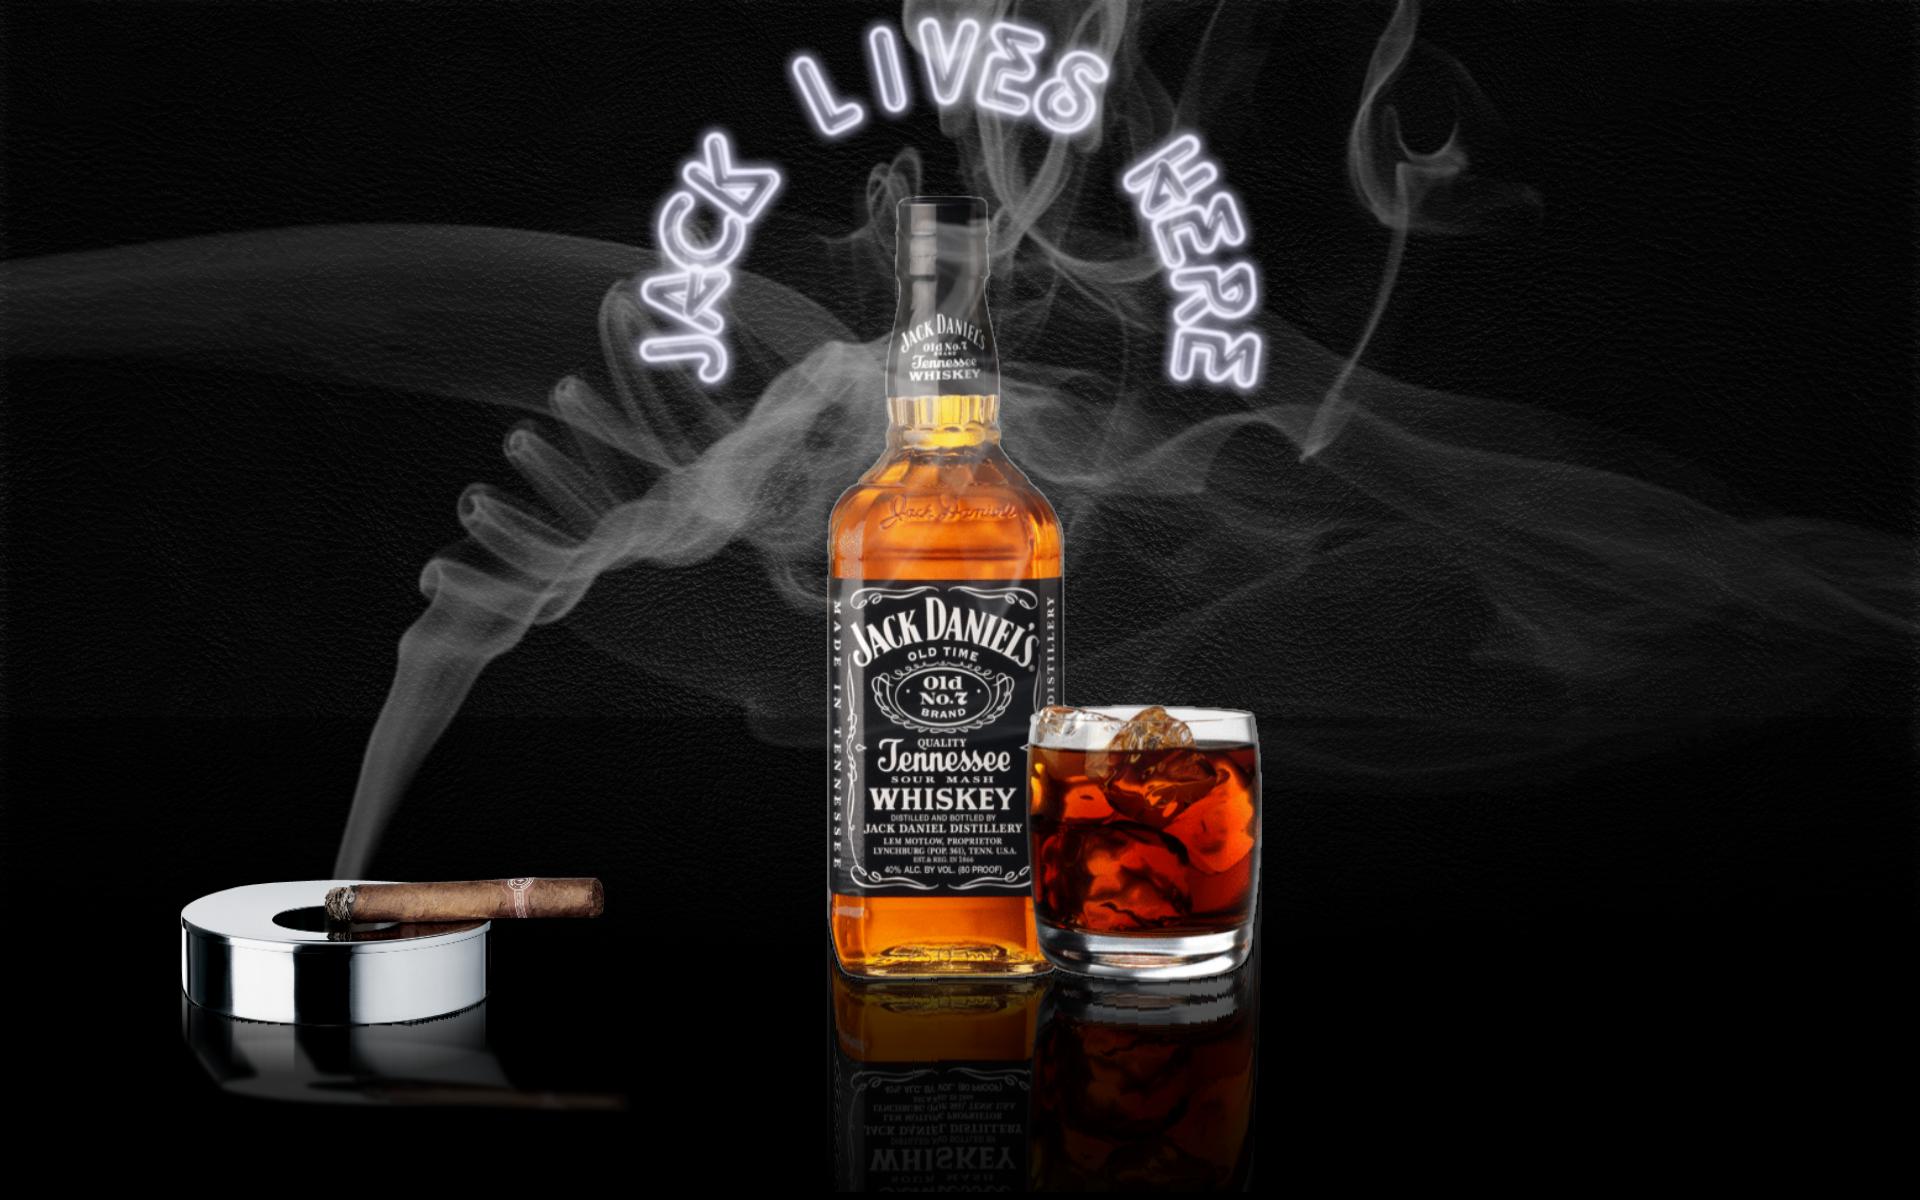 Jack Daniels And Cigarette HD Wallpaper Image For PC Desktop Wallsev 1920x1200